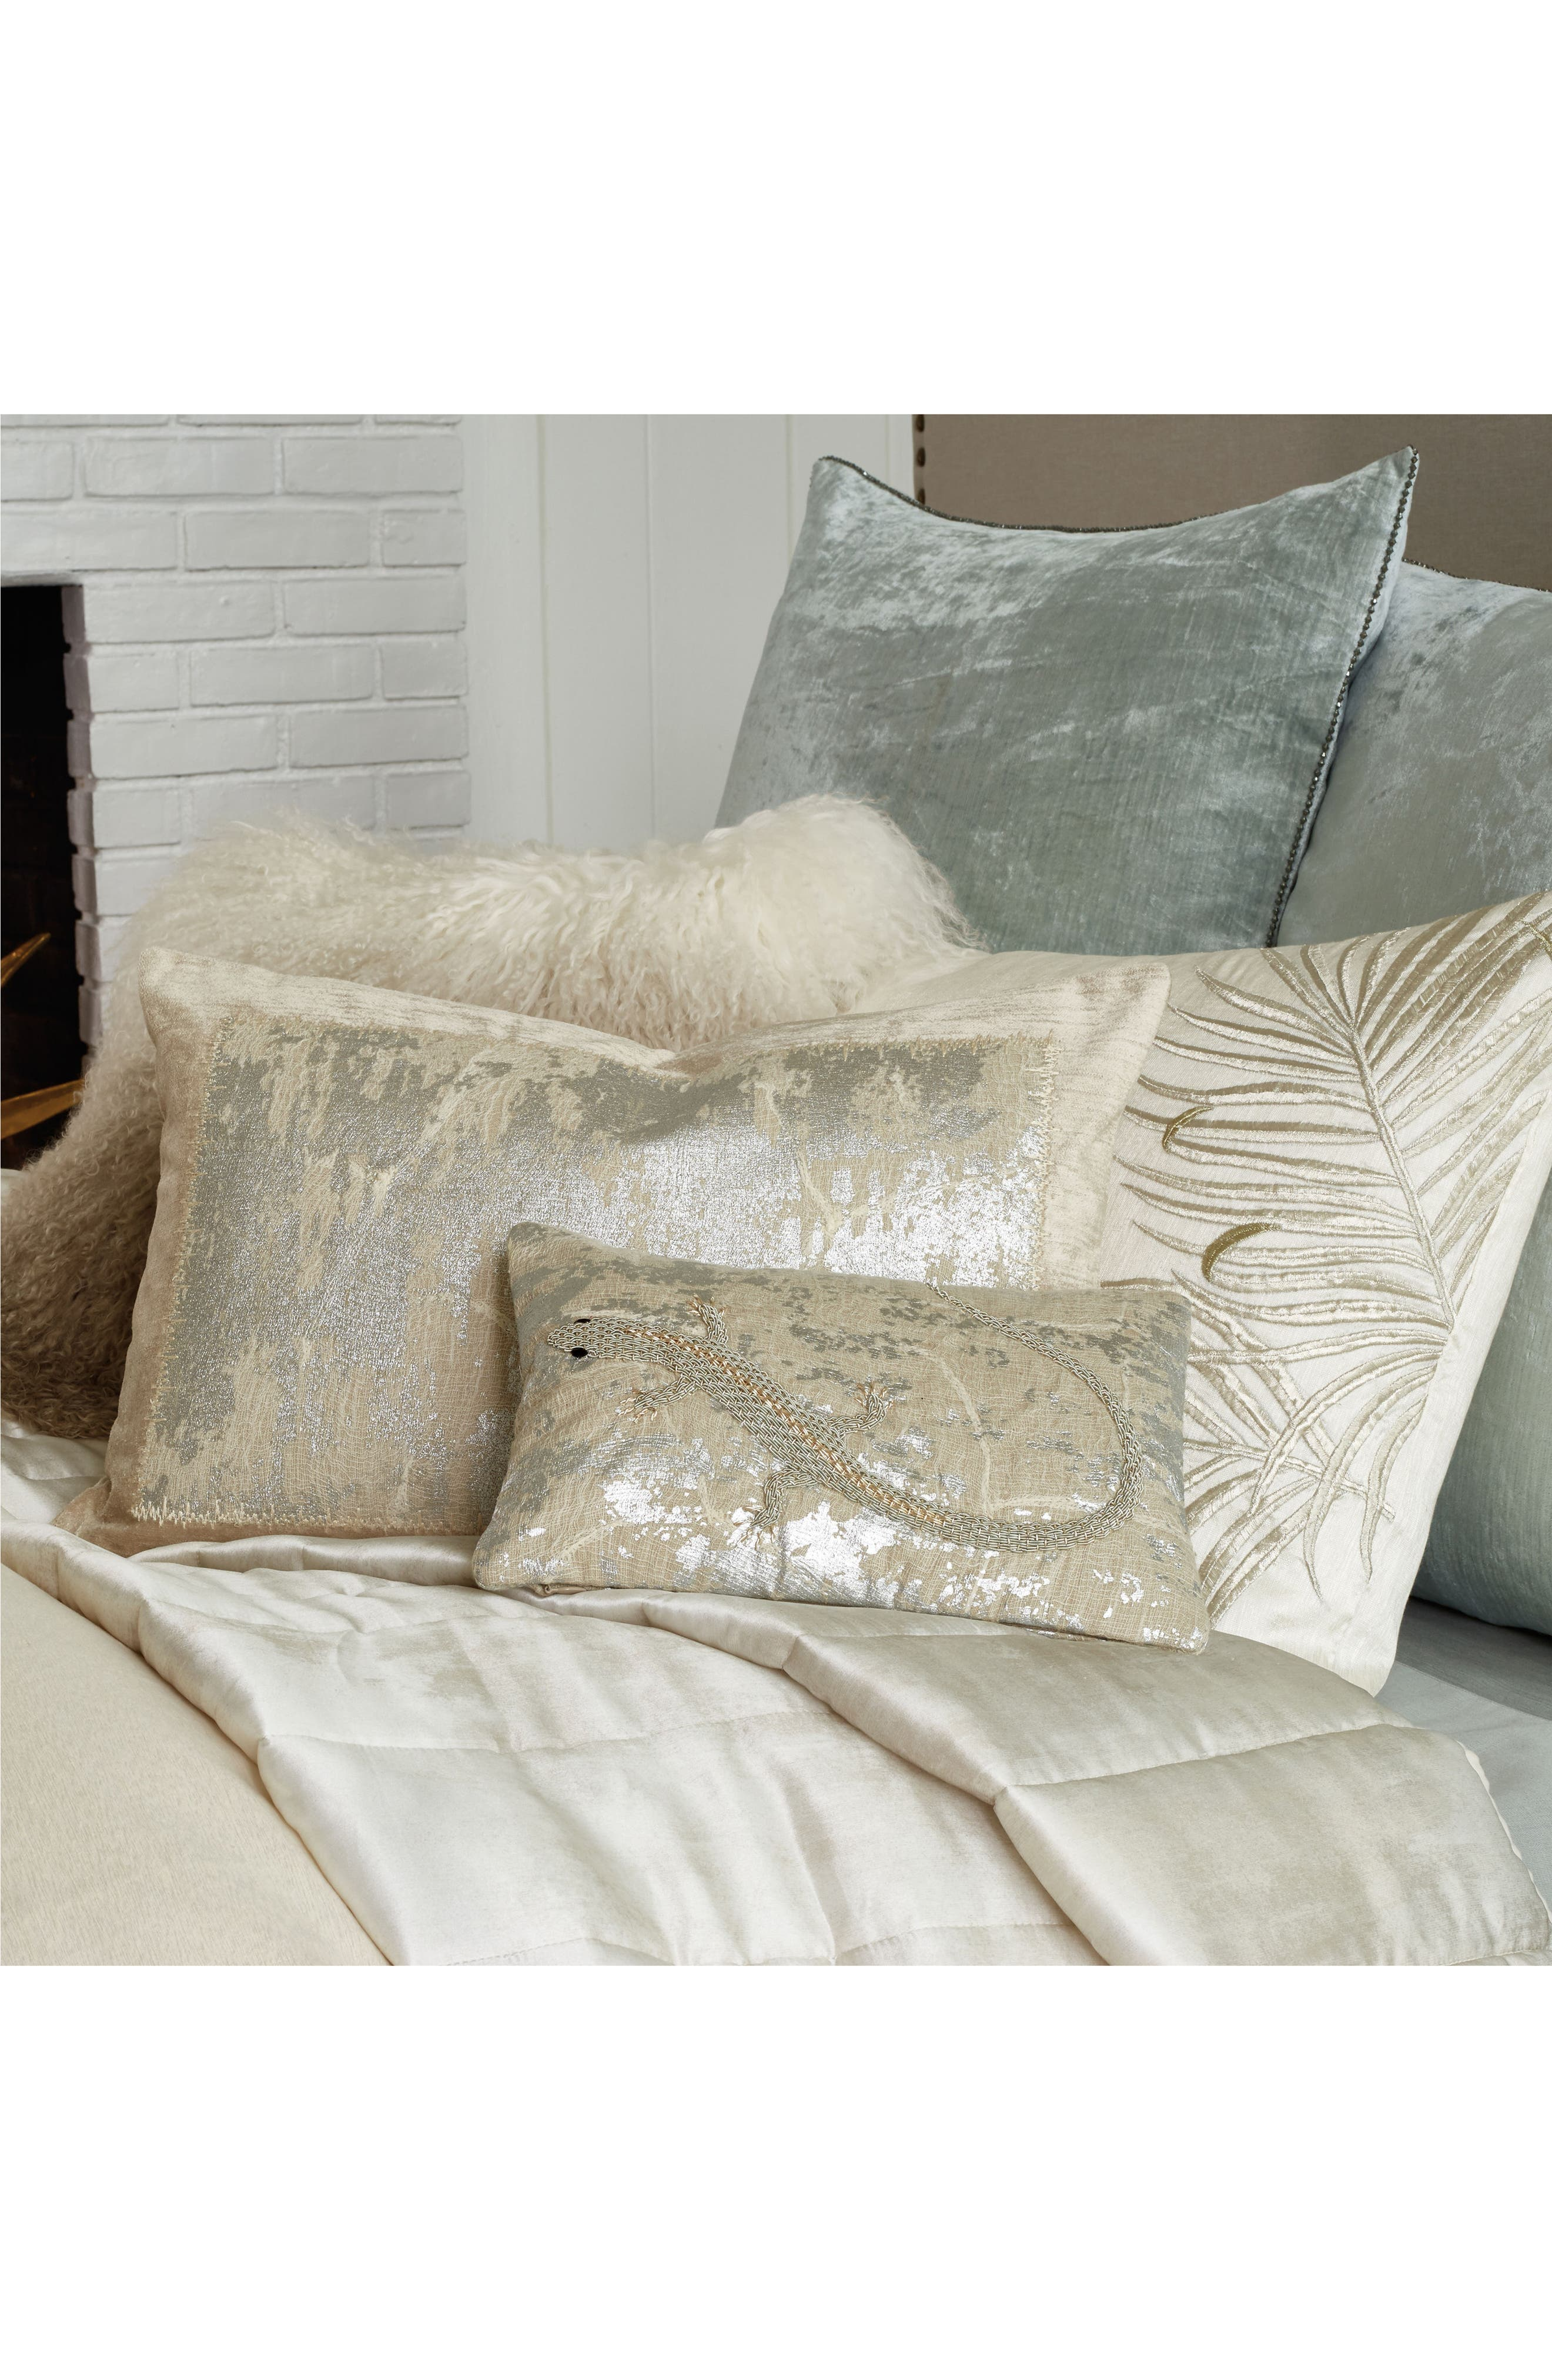 MICHAEL ARAM,                             Lizard Embroidered Decorative Pillow,                             Alternate thumbnail 2, color,                             SILVER